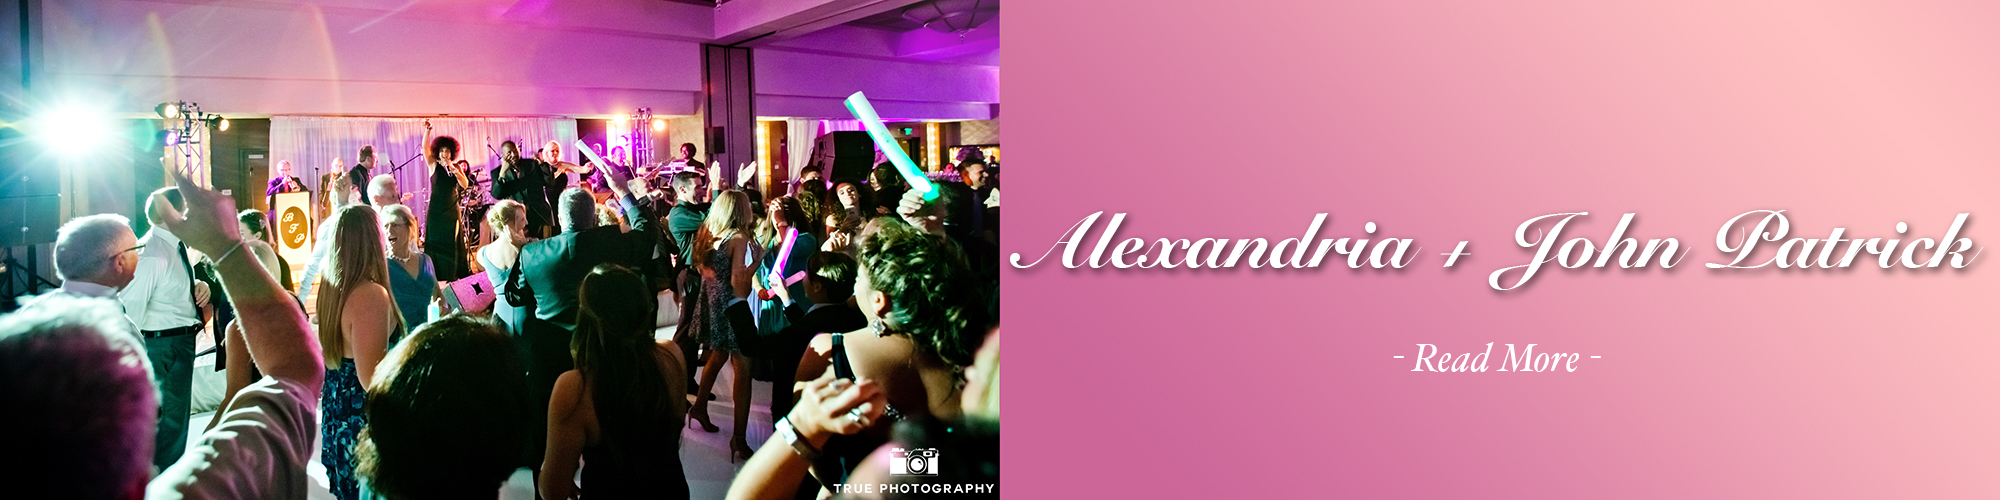 Wedding Band Alexandria & John-Patrick.jpg